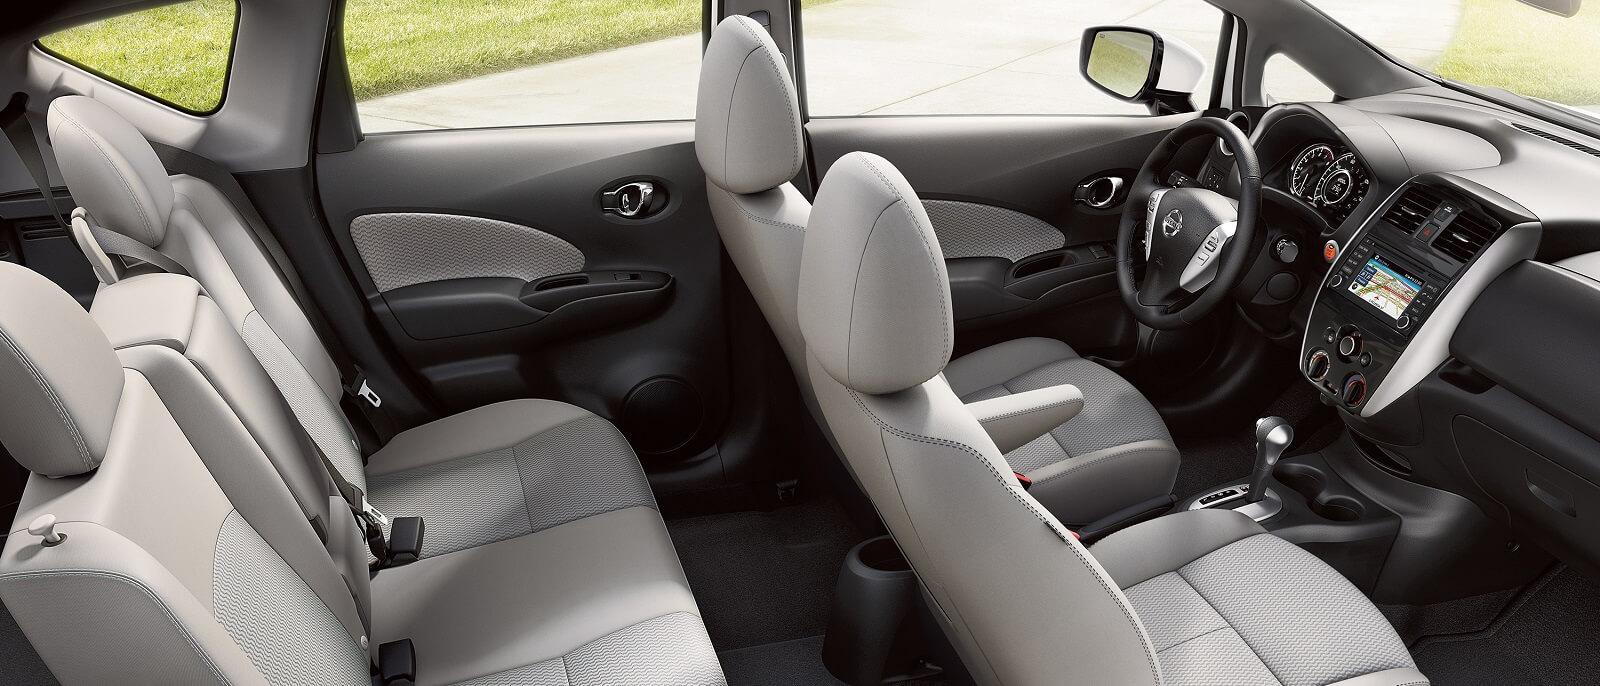 2016 nissan versa note interior seating